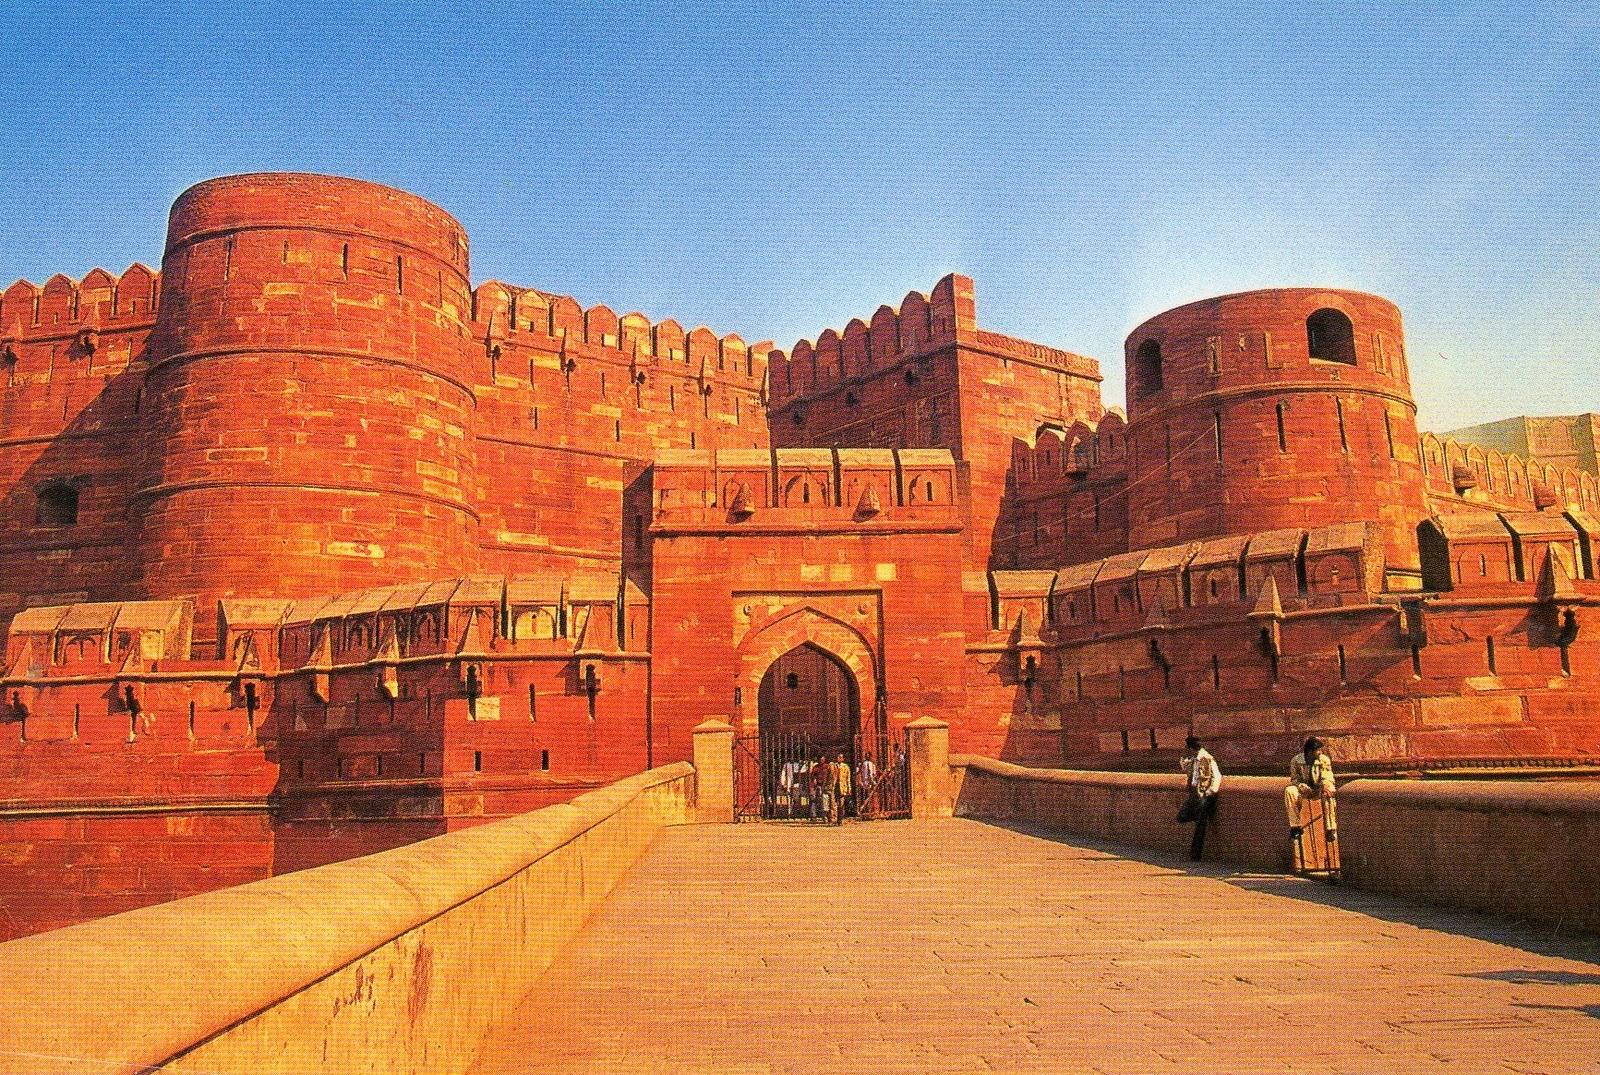 Sejarah Berdirinya Kerajaan Mughal di India dan Perkembangannya!